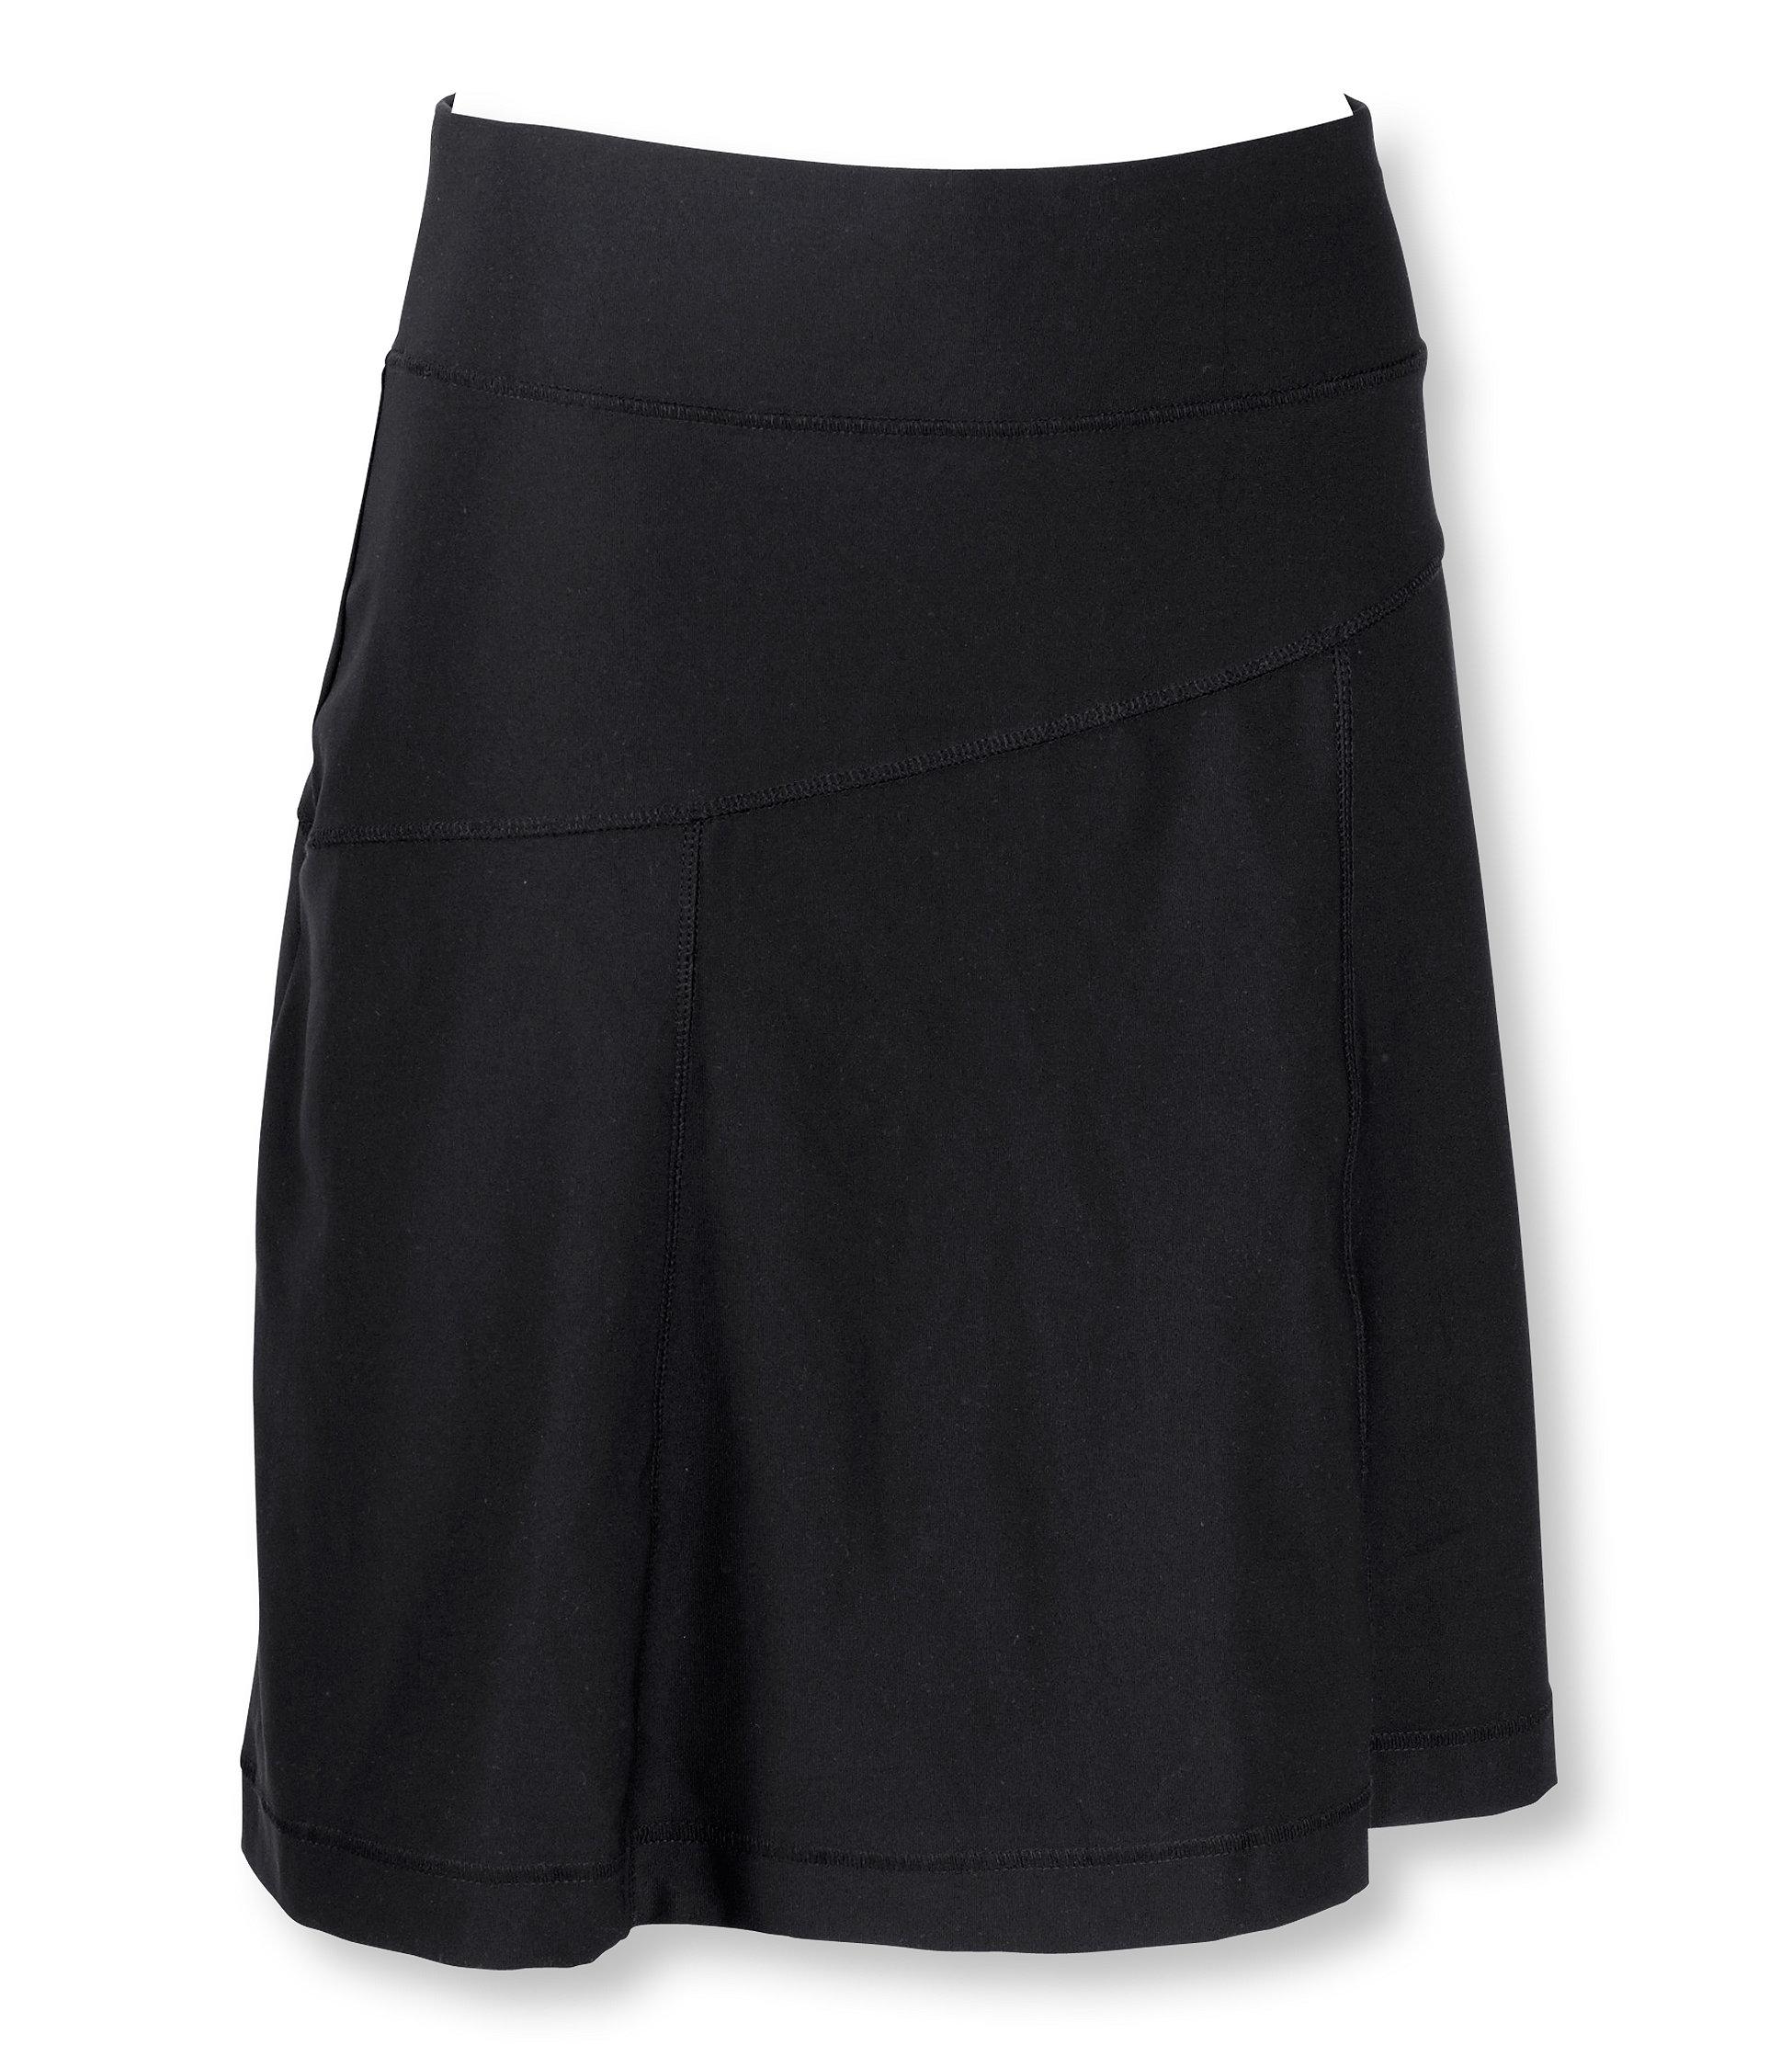 L.L.Bean Fitness Skirt